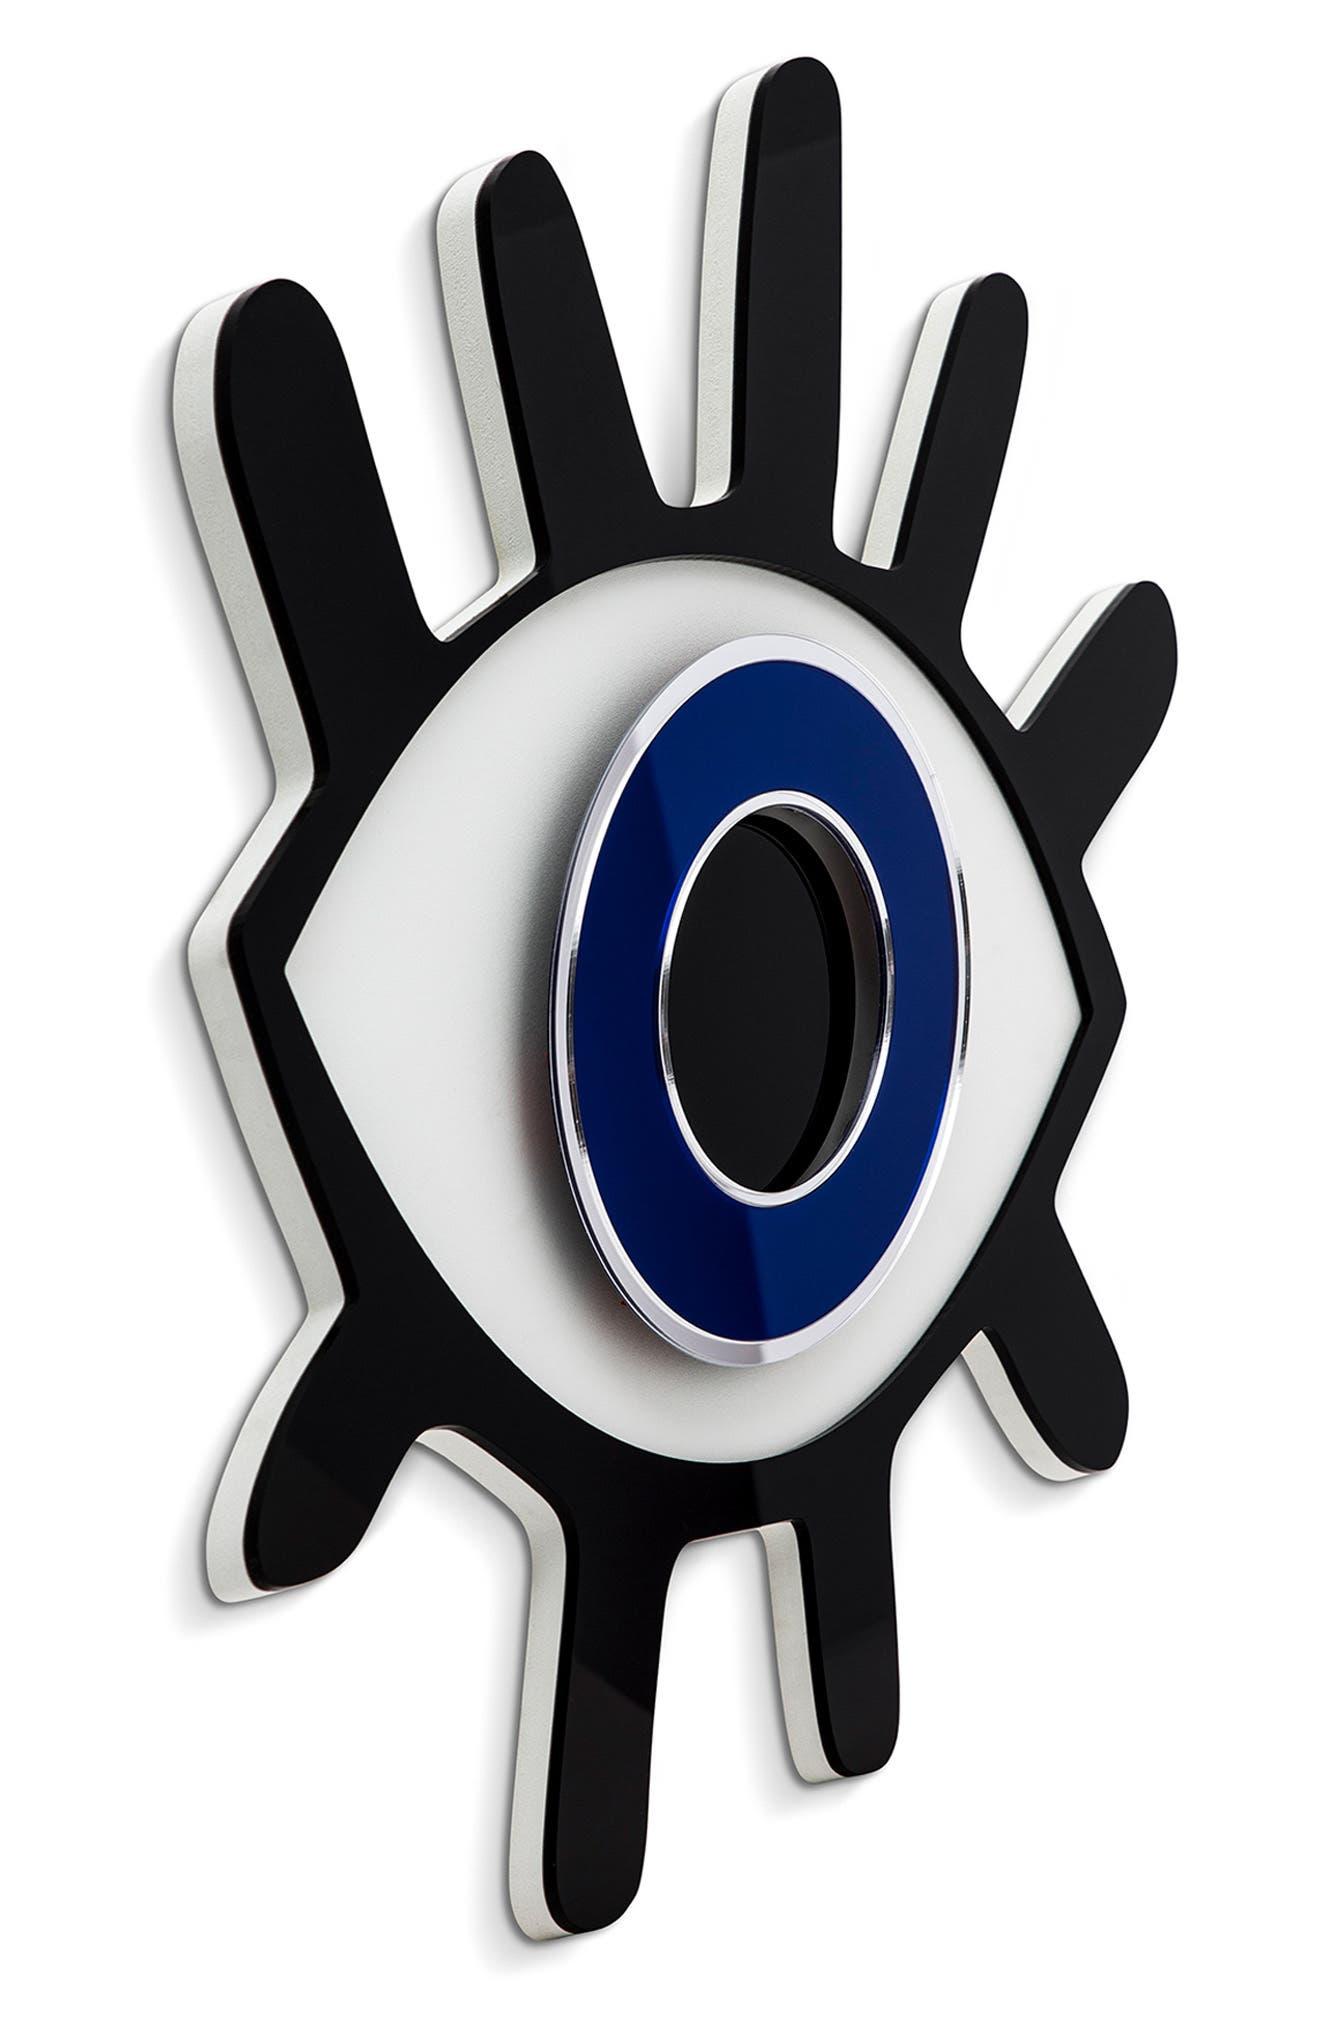 ,                             Lashed Evil Eye Wall Art,                             Alternate thumbnail 2, color,                             BLUE BLACK AND WHITE